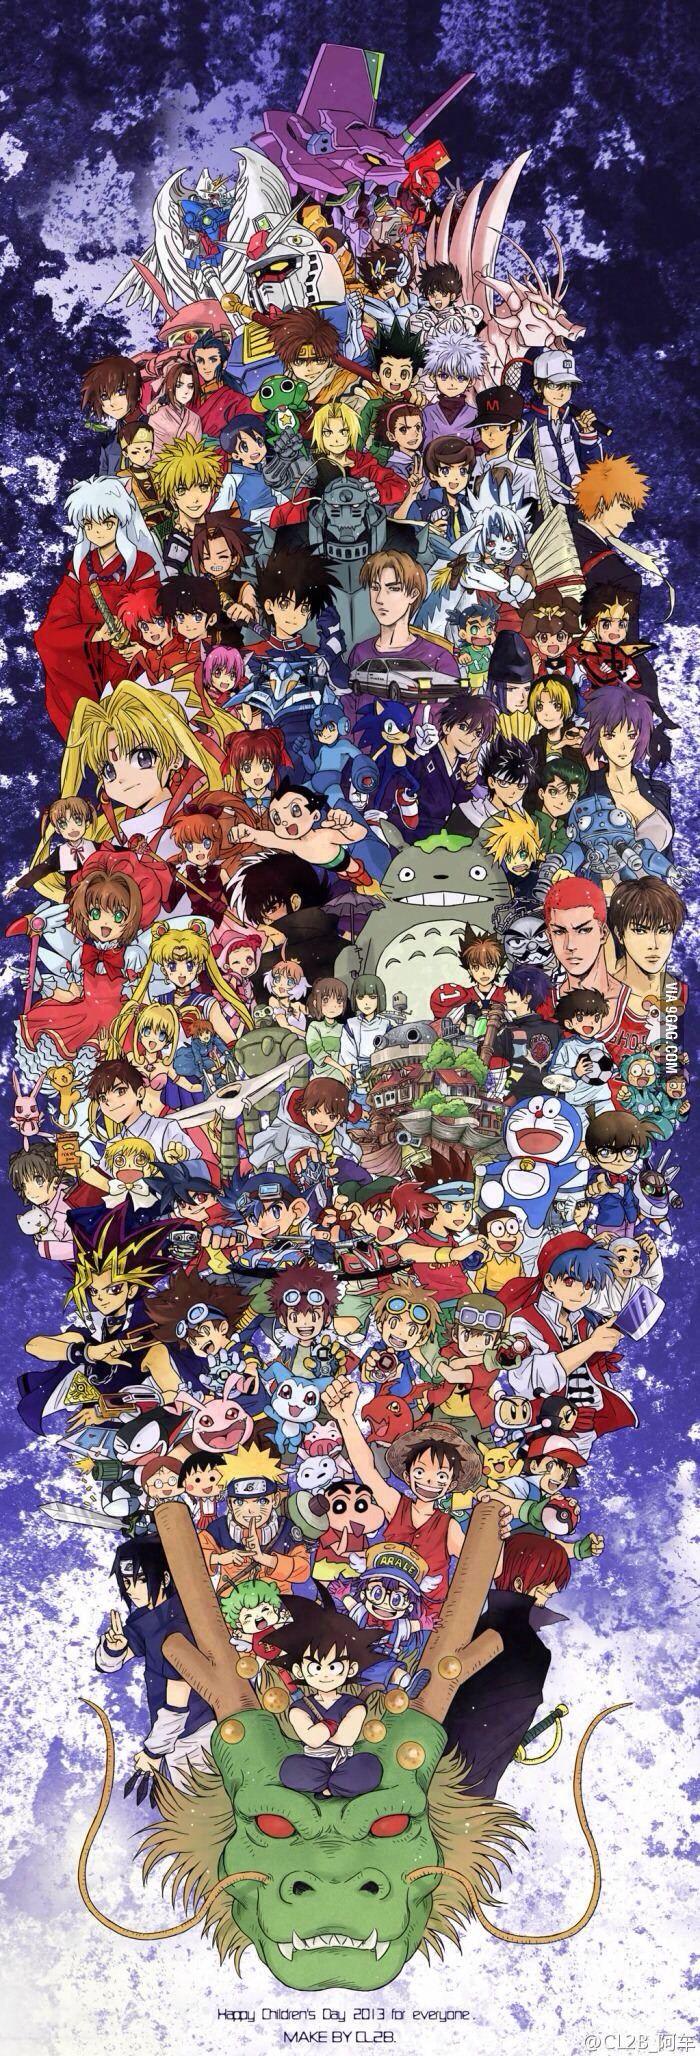 Anime - Page 4 5137bbdb62de6d512d60bee837597a36